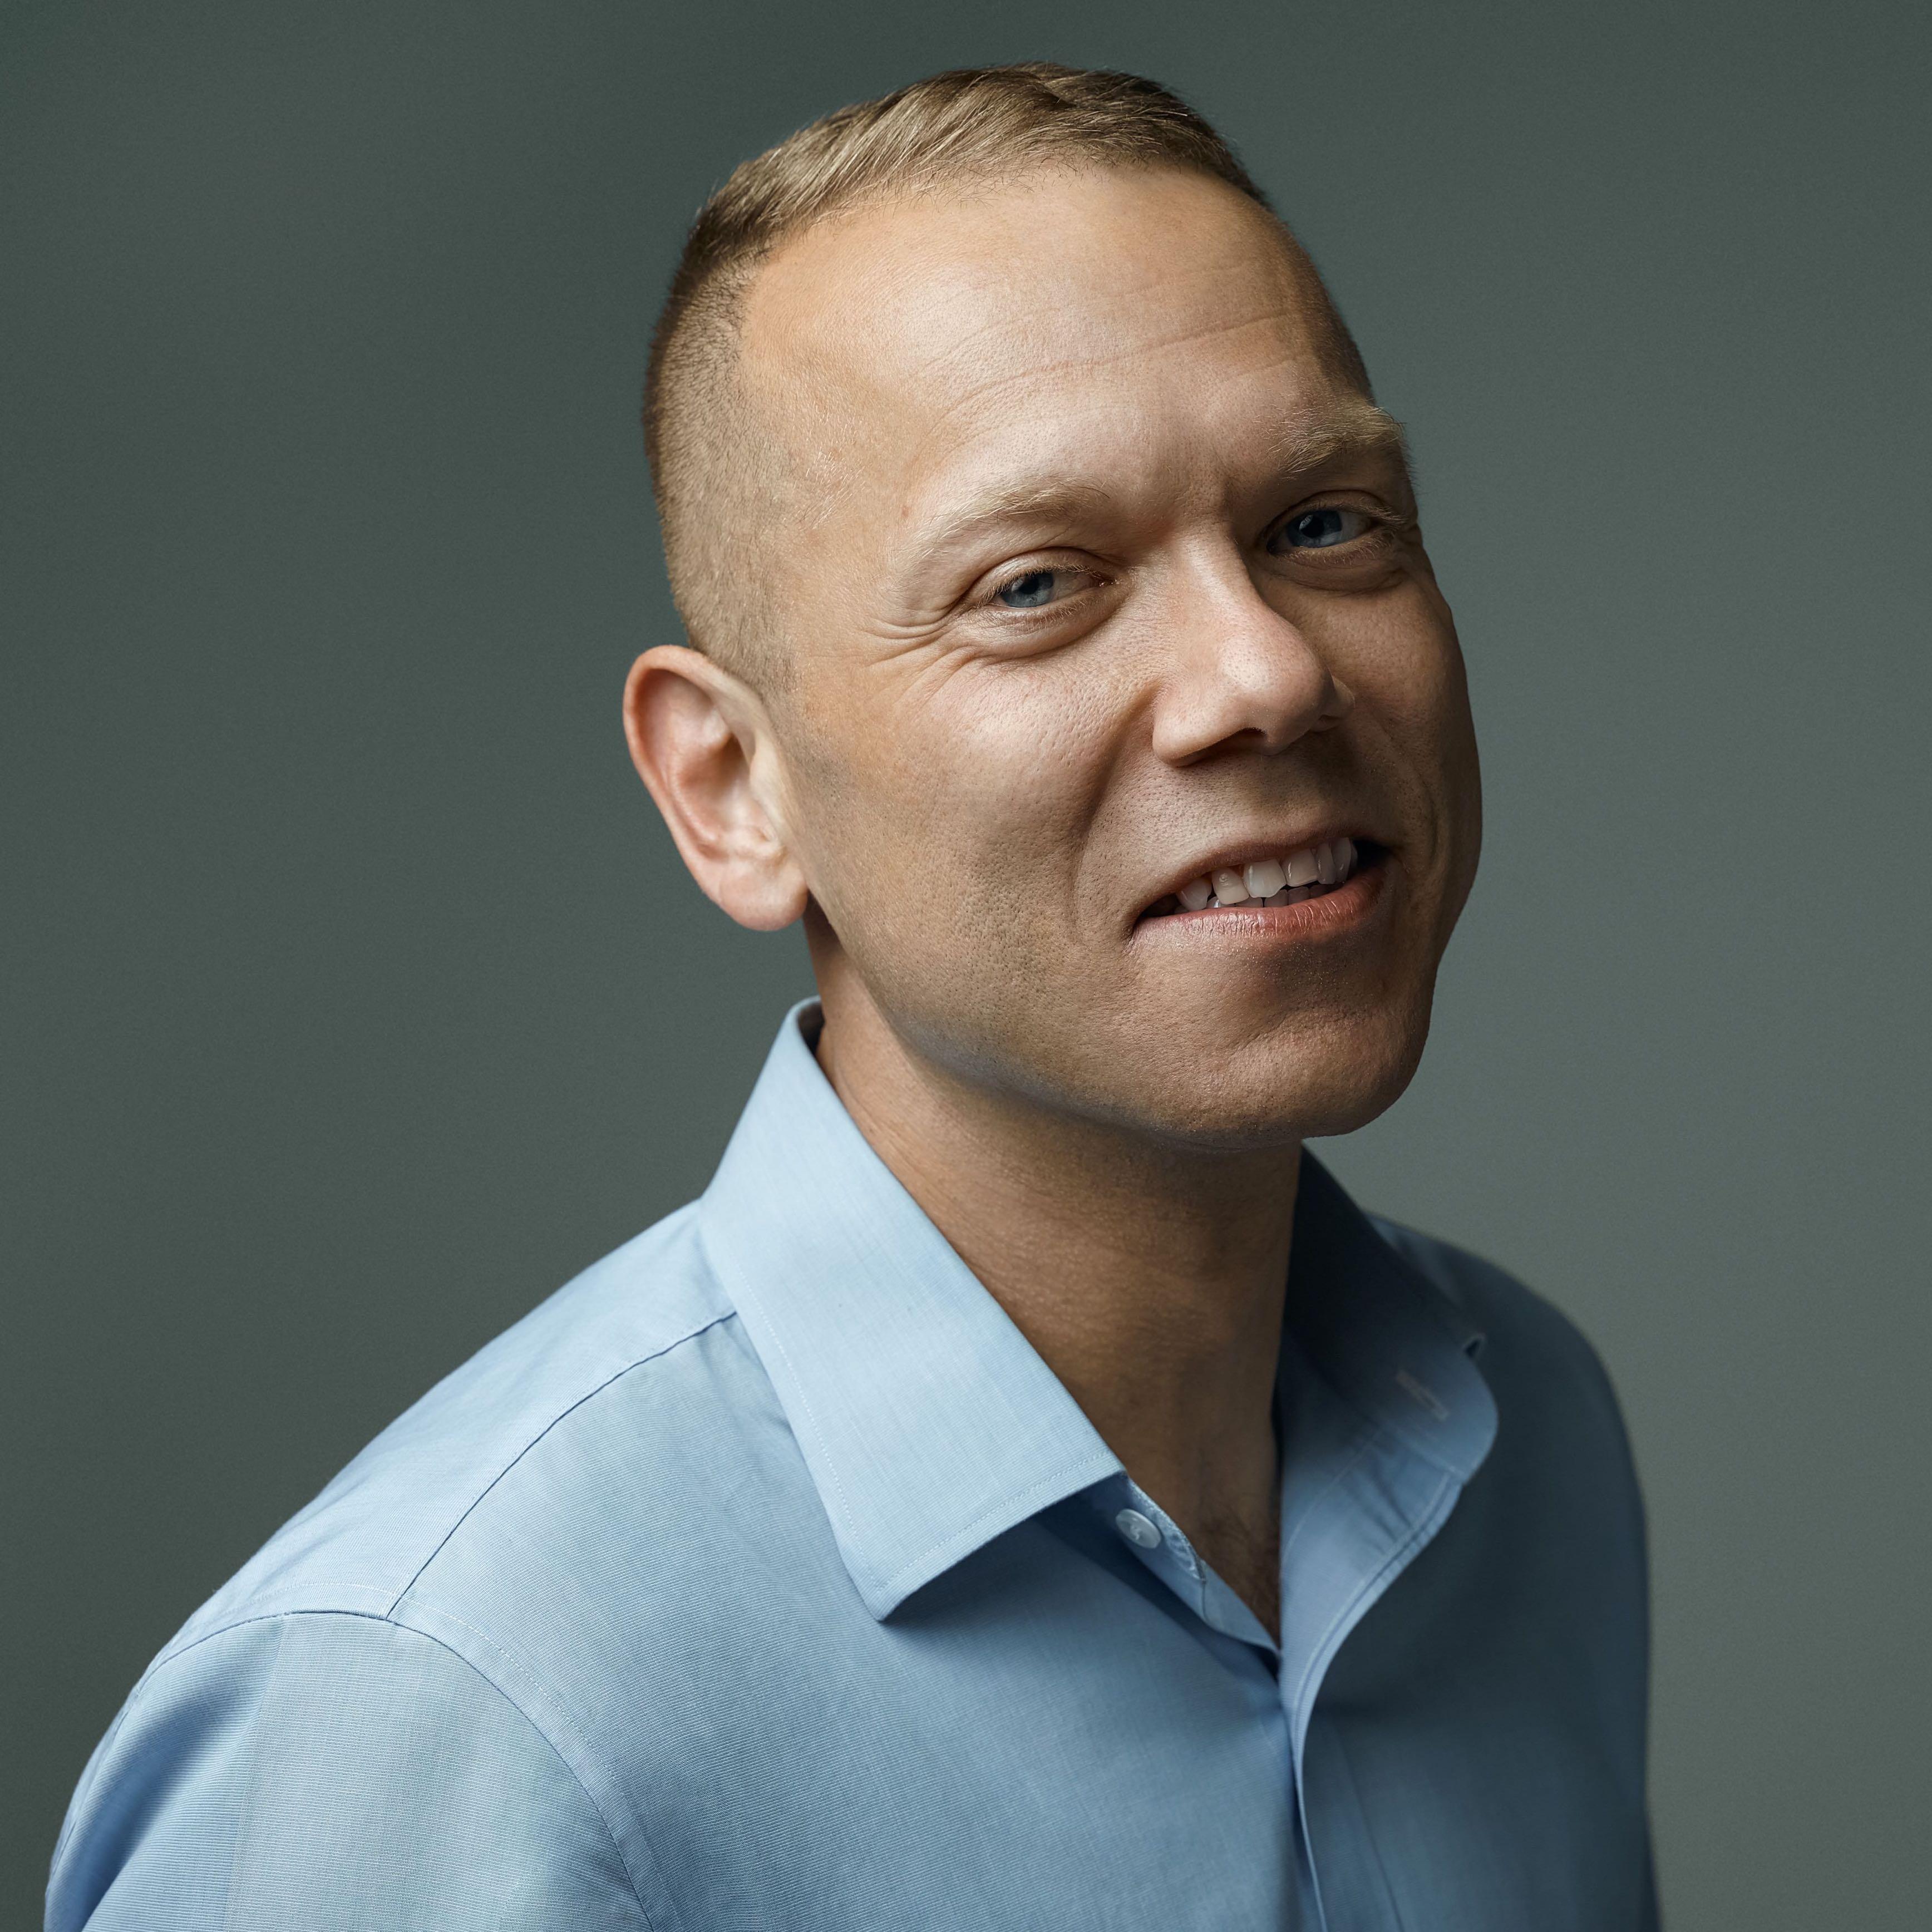 Neil Blair Christensen